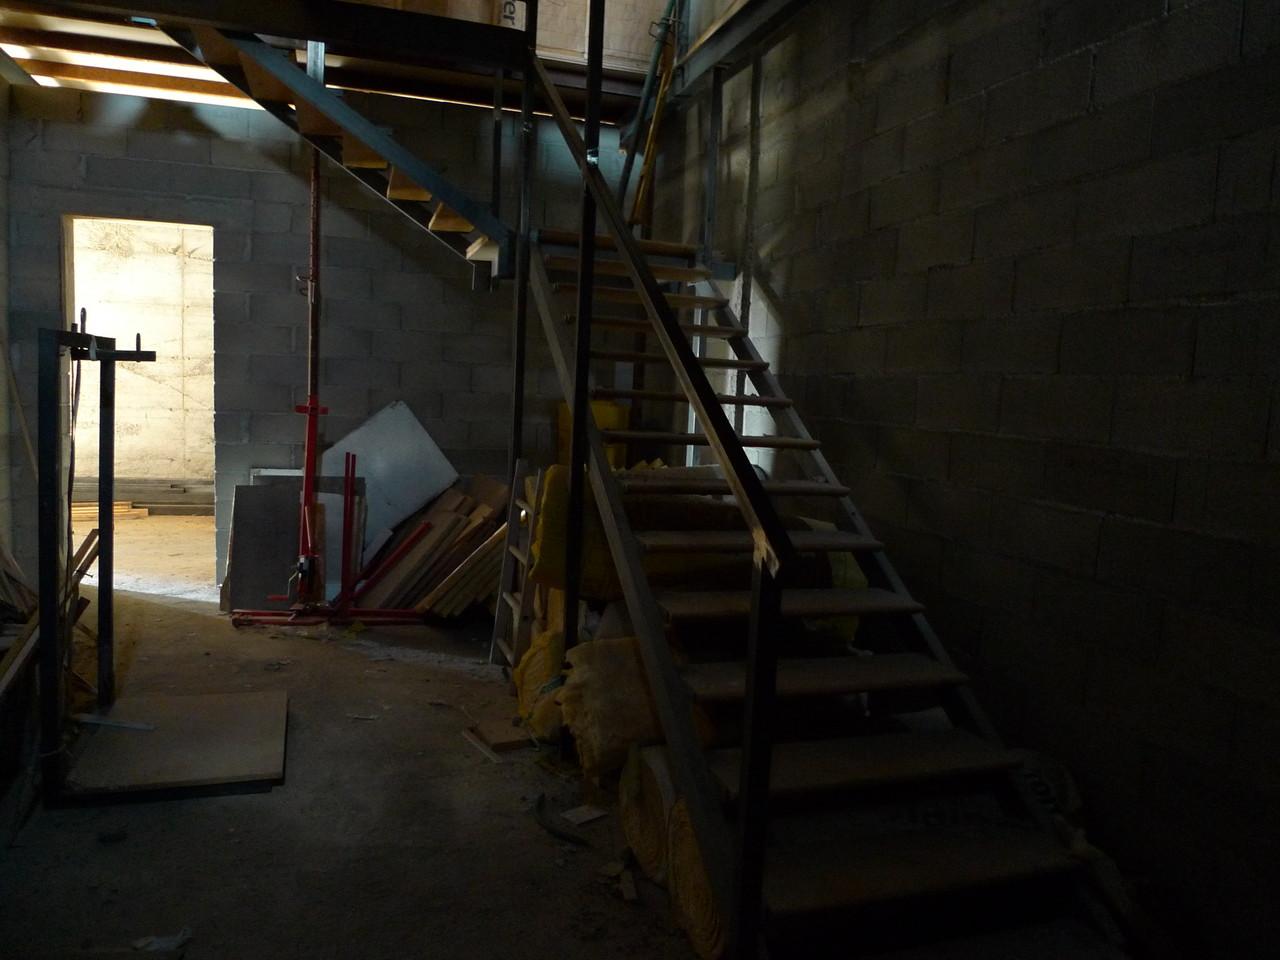 Escalier du 1er bâtiment